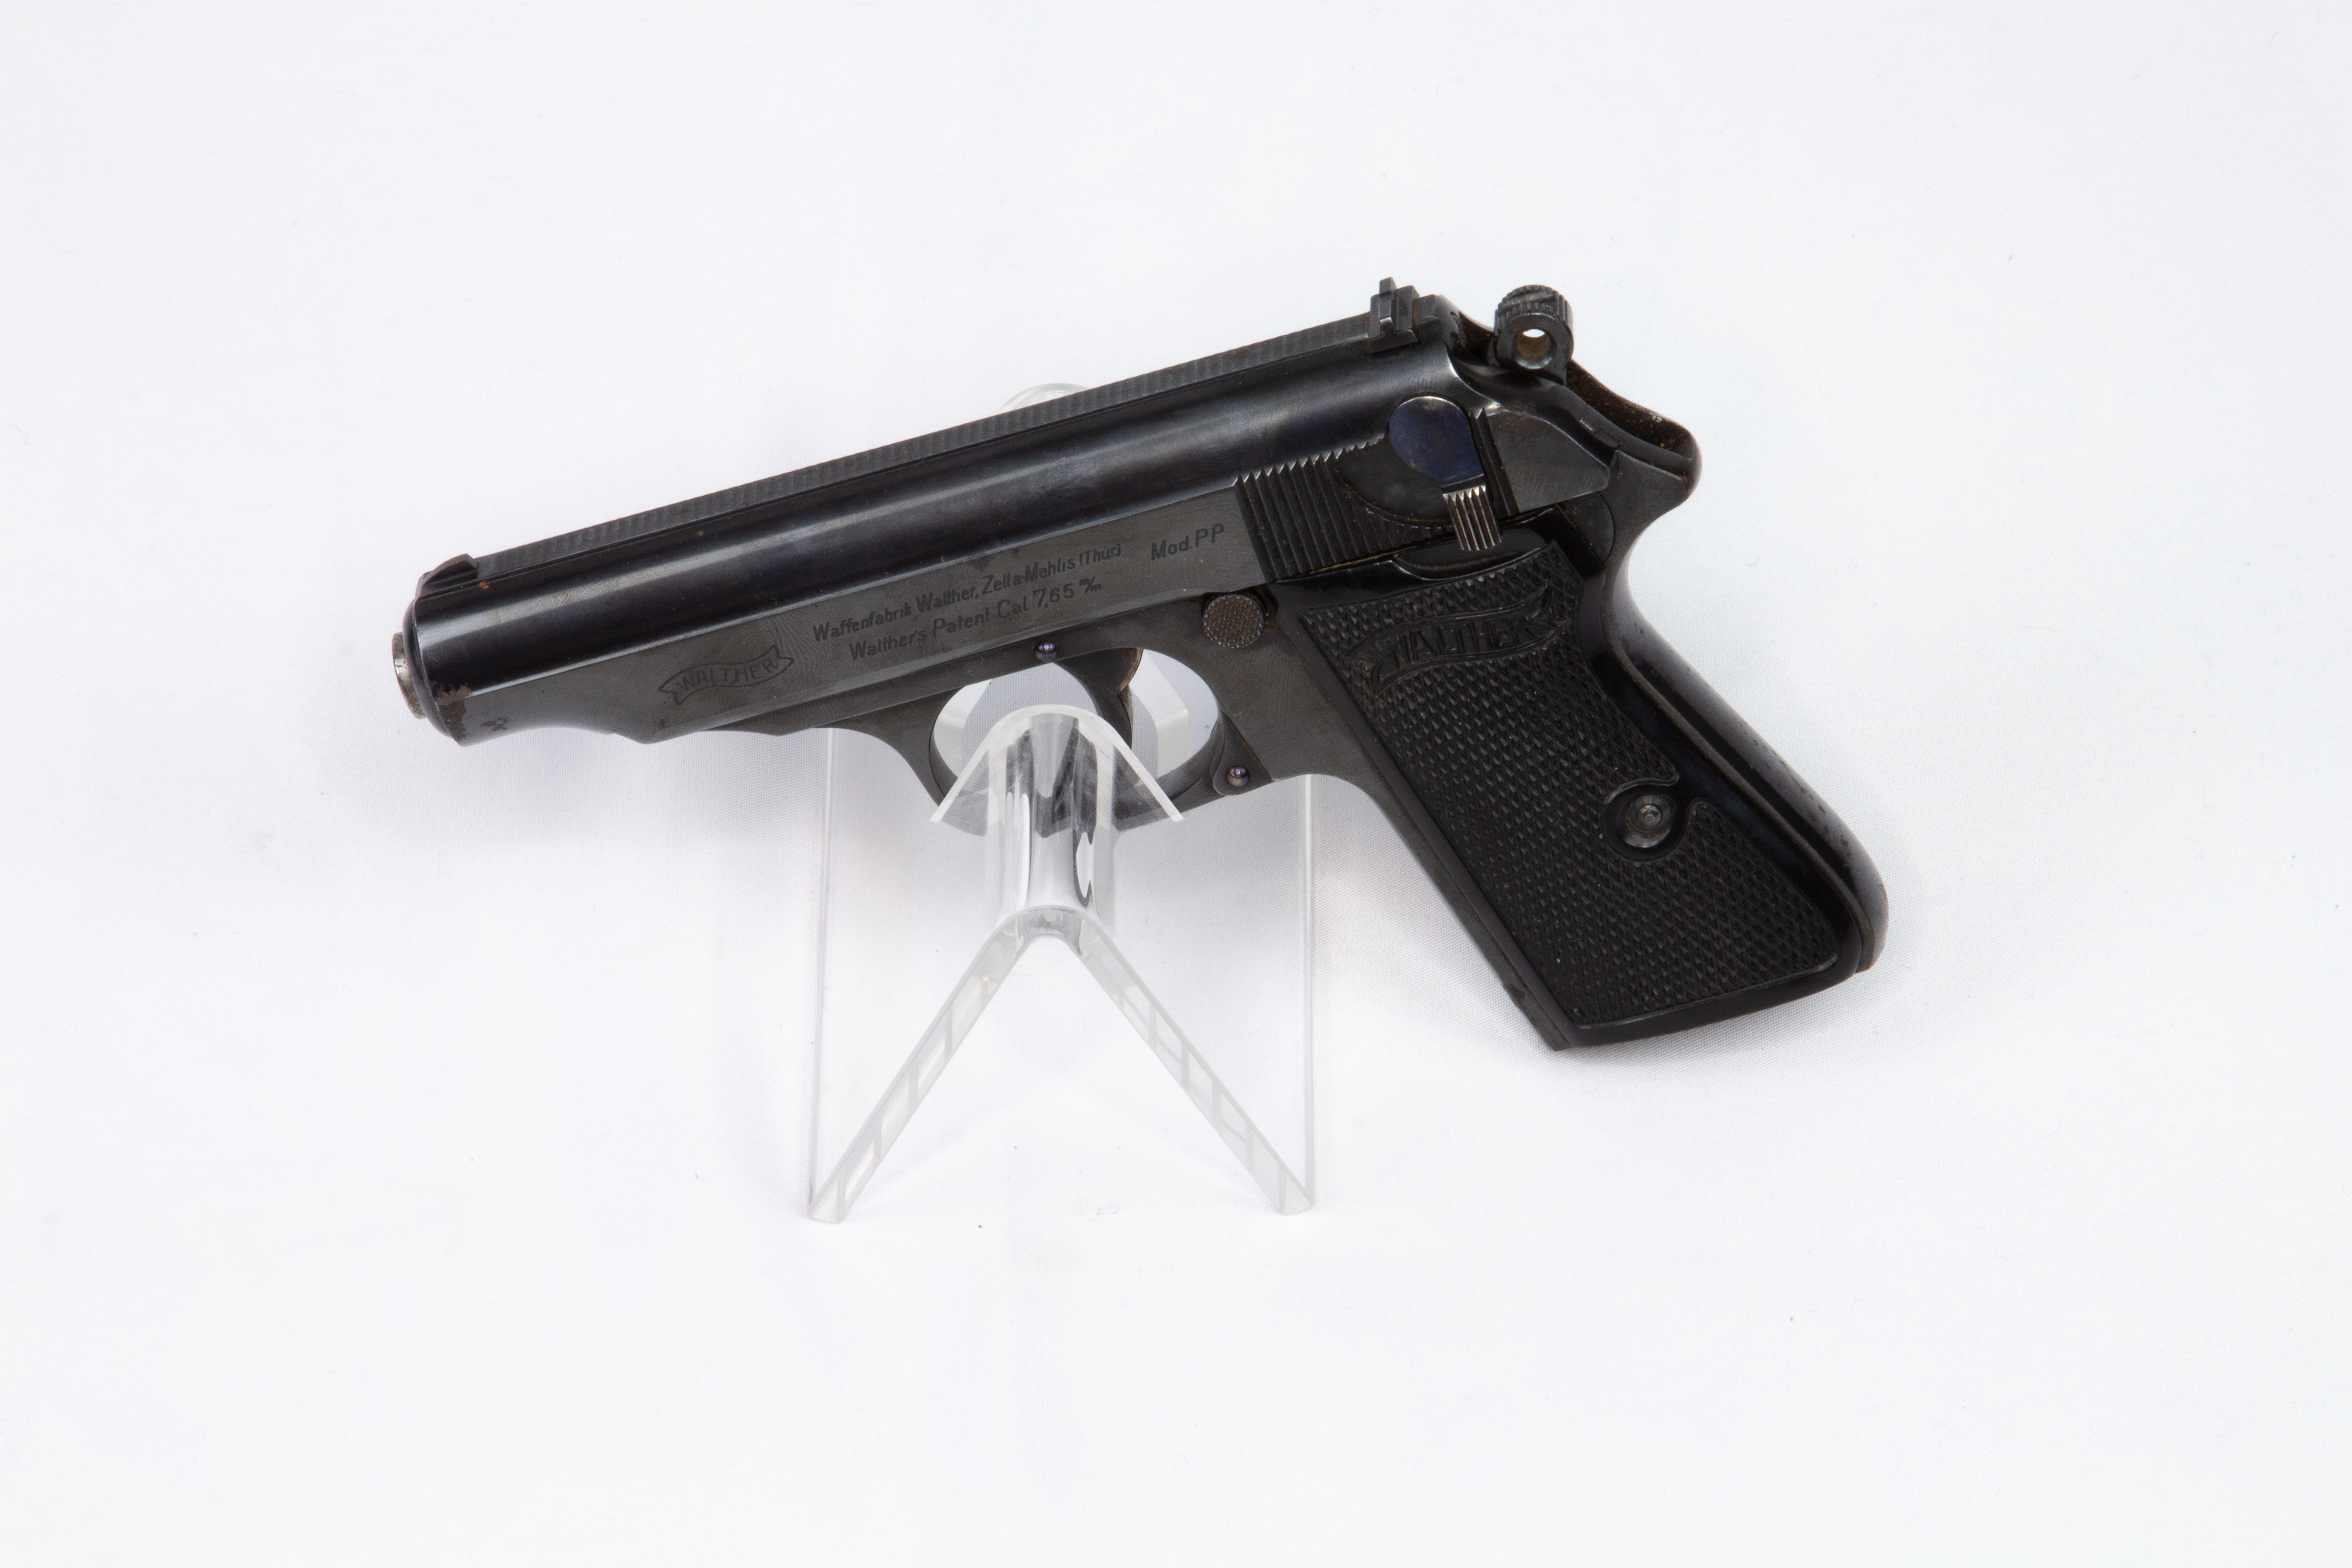 gebr. WALTHER Pistole Mod. PPK Zella-Mehlis